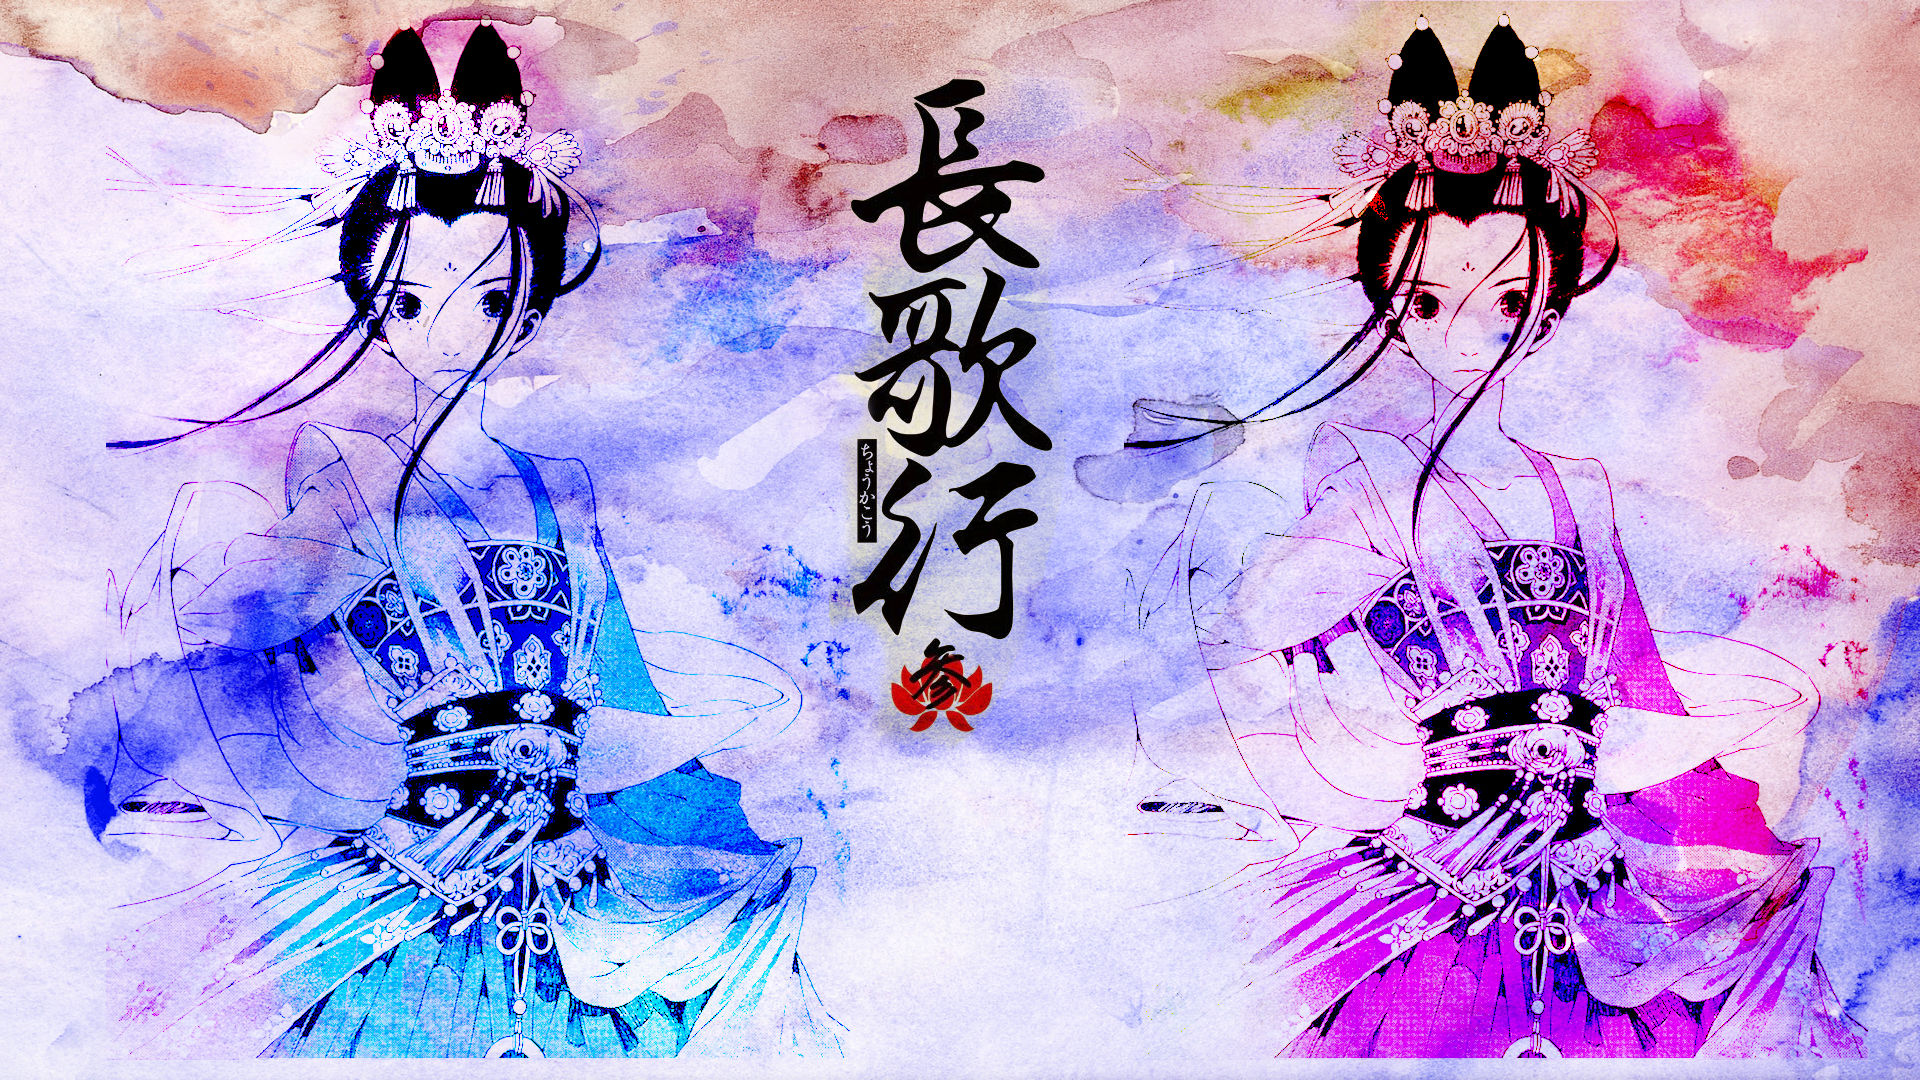 Chang Ge Xing - wallpaper by Tarlan